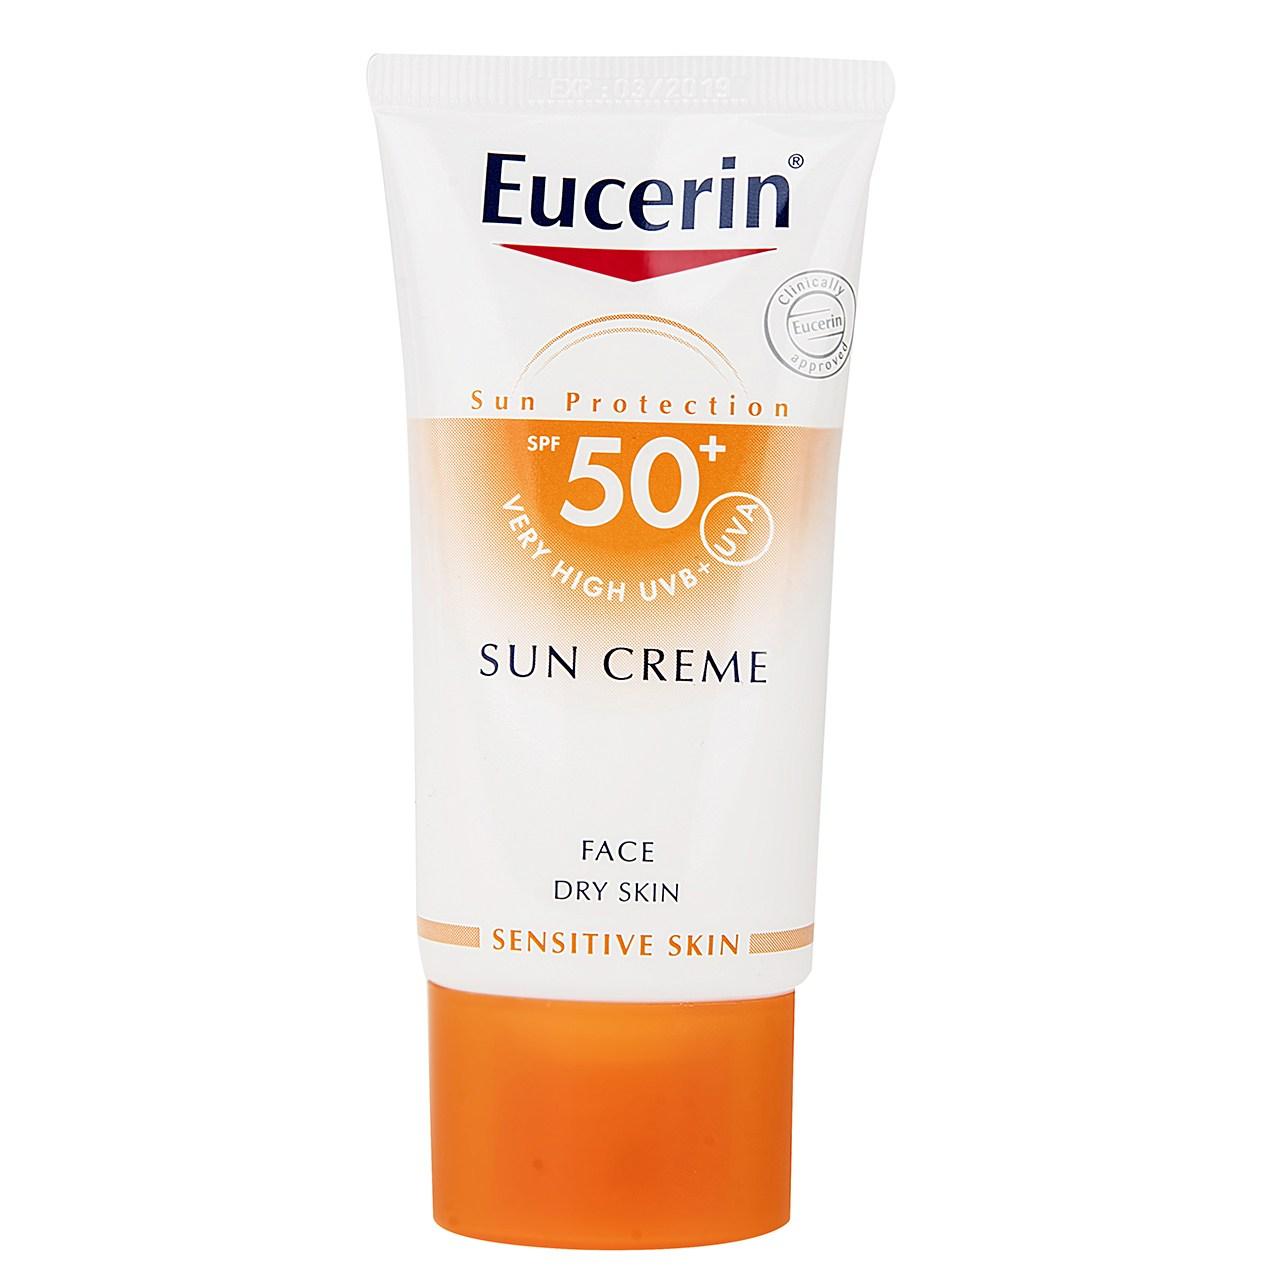 قیمت کرم ضد آفتاب اوسرین سری Sun Protection Spf50 حجم 50 میلی لیتر